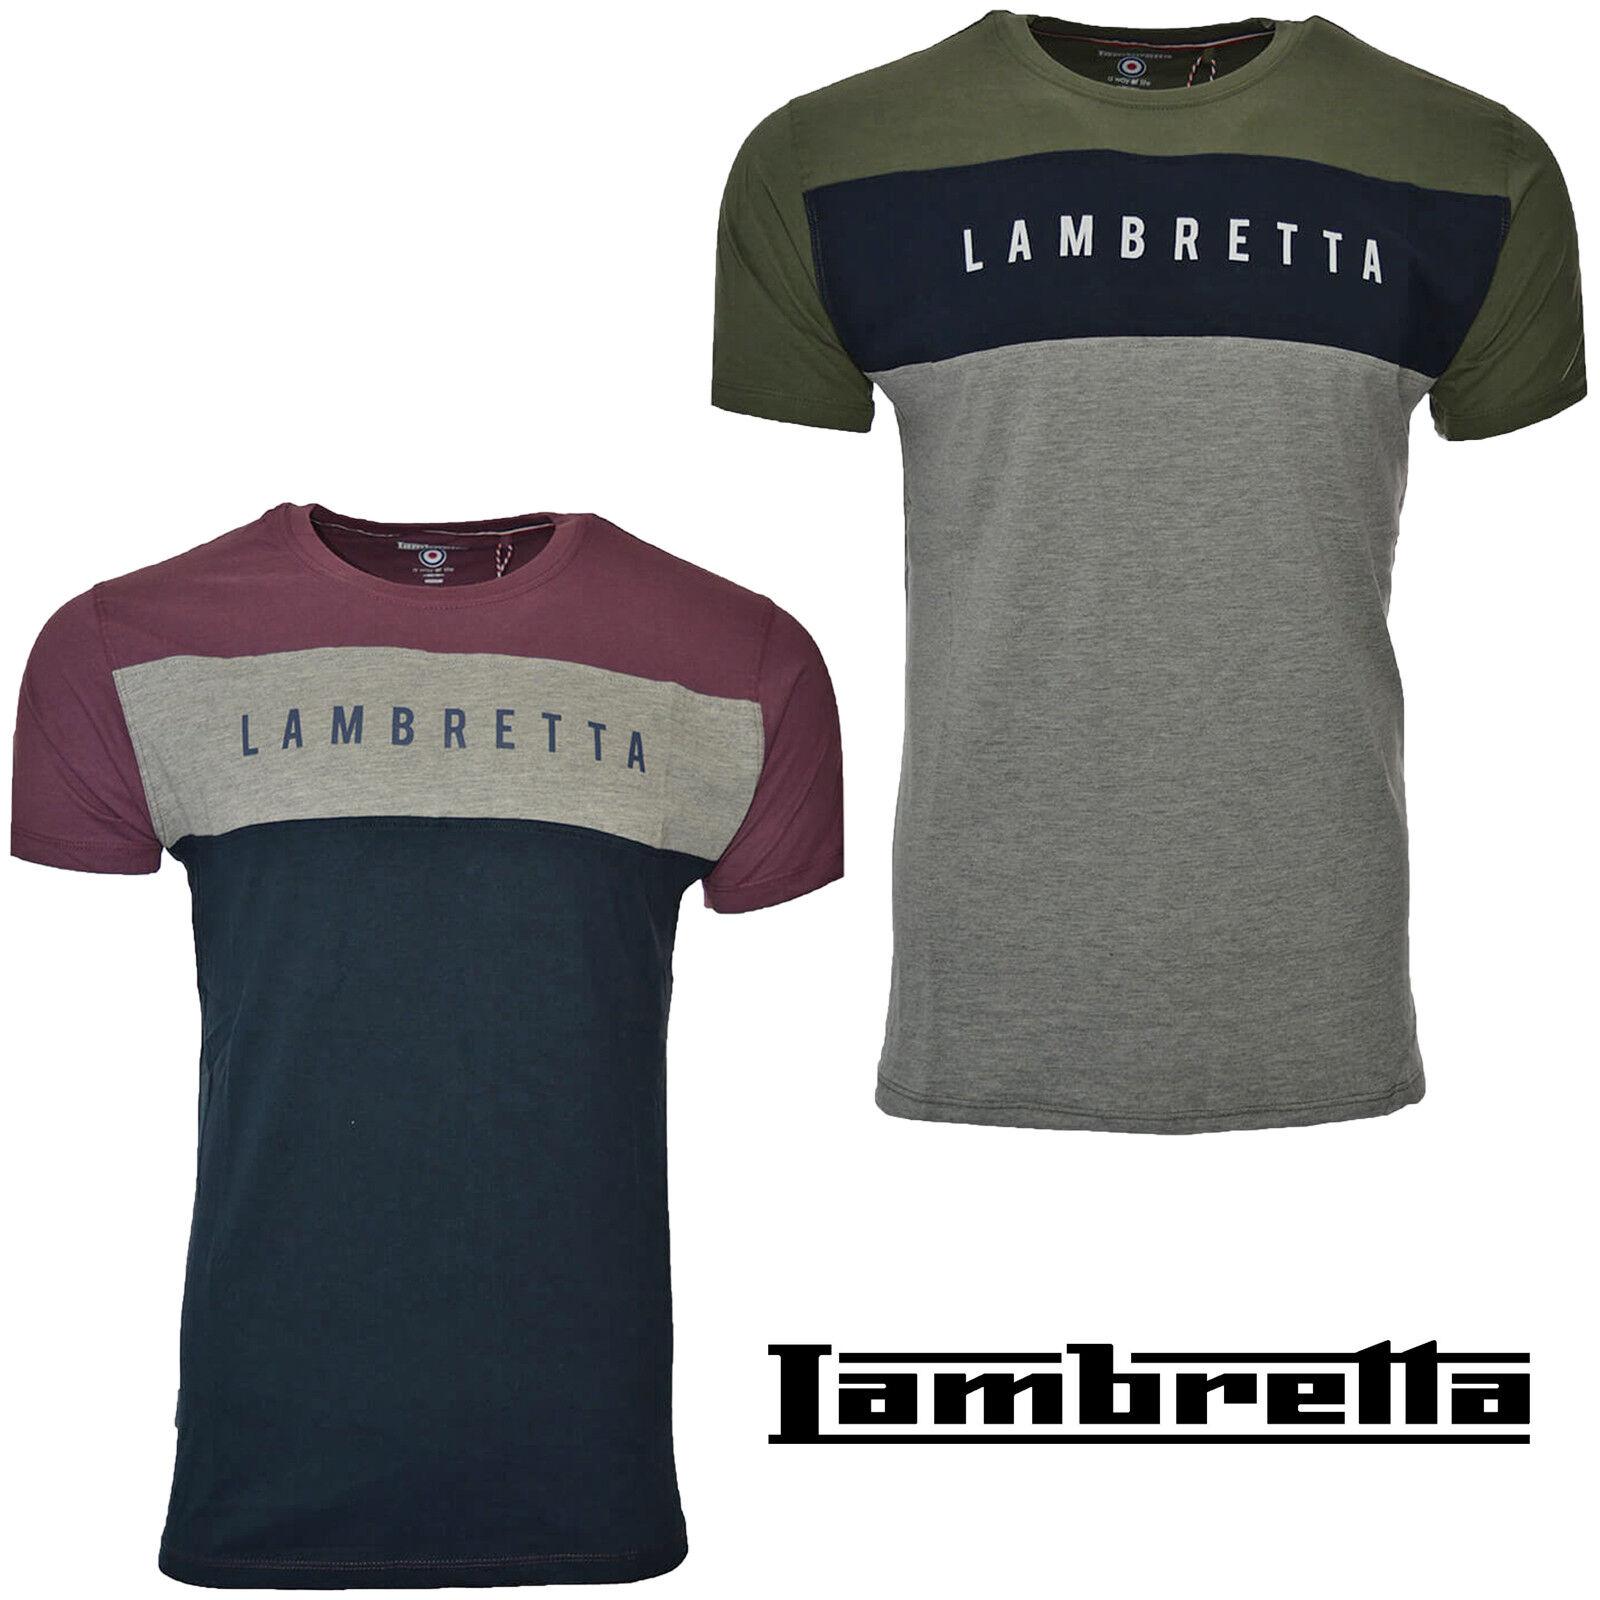 e789daa568cf 4xl T Shirts Uk - DREAMWORKS